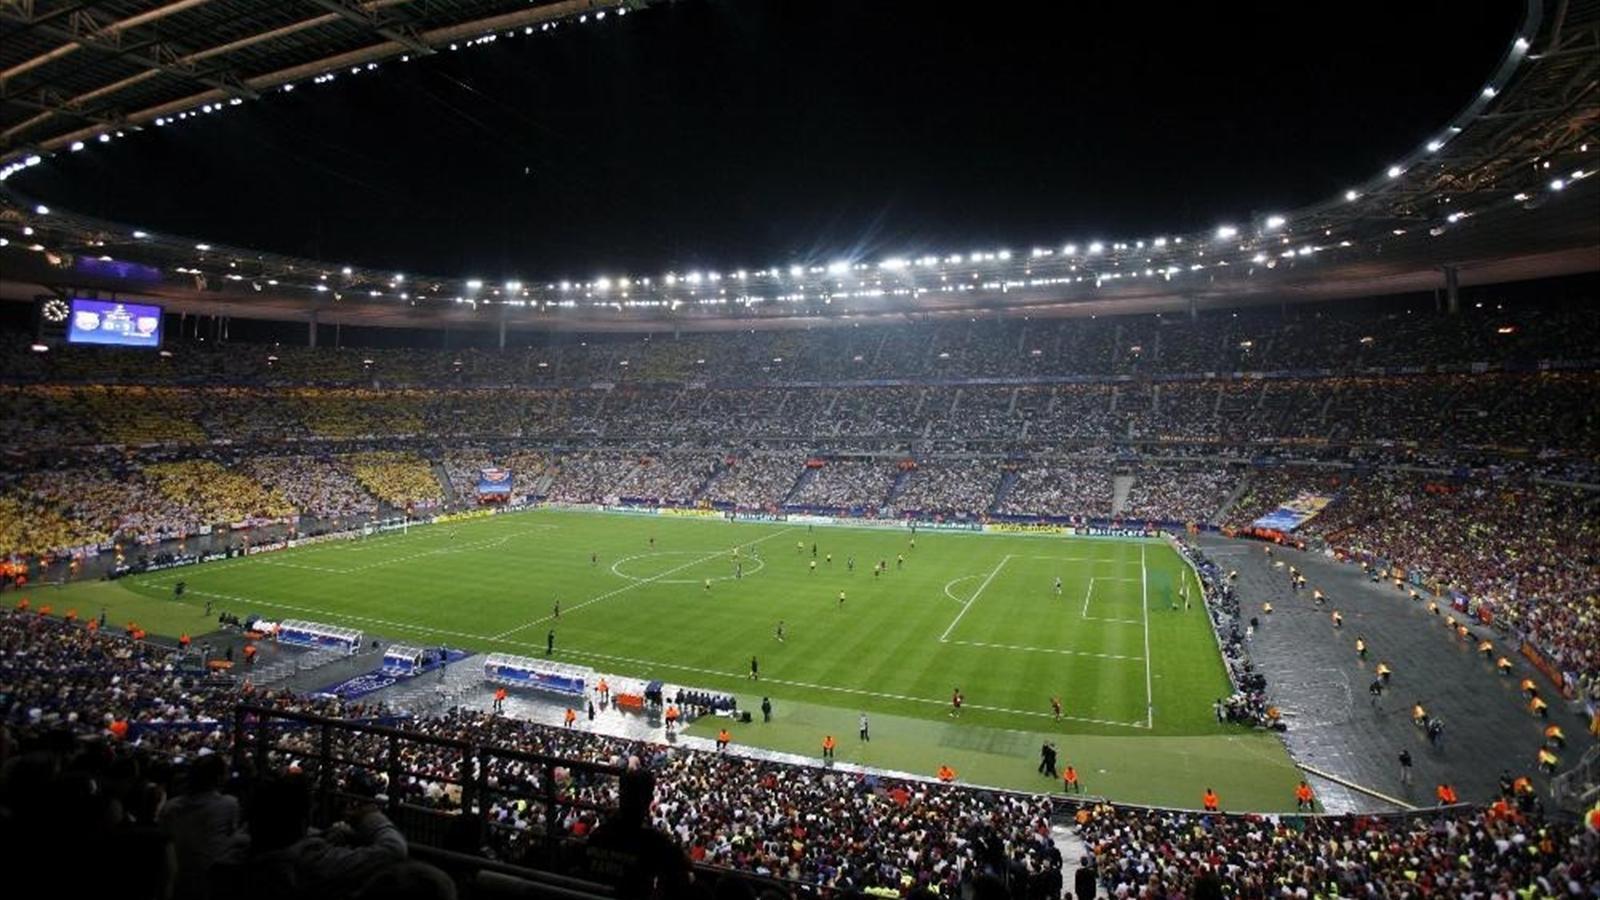 Euro 2016 calendrier horaires villes matches des bleus toutes les infos euro 2016 - Coupe de france football calendrier ...